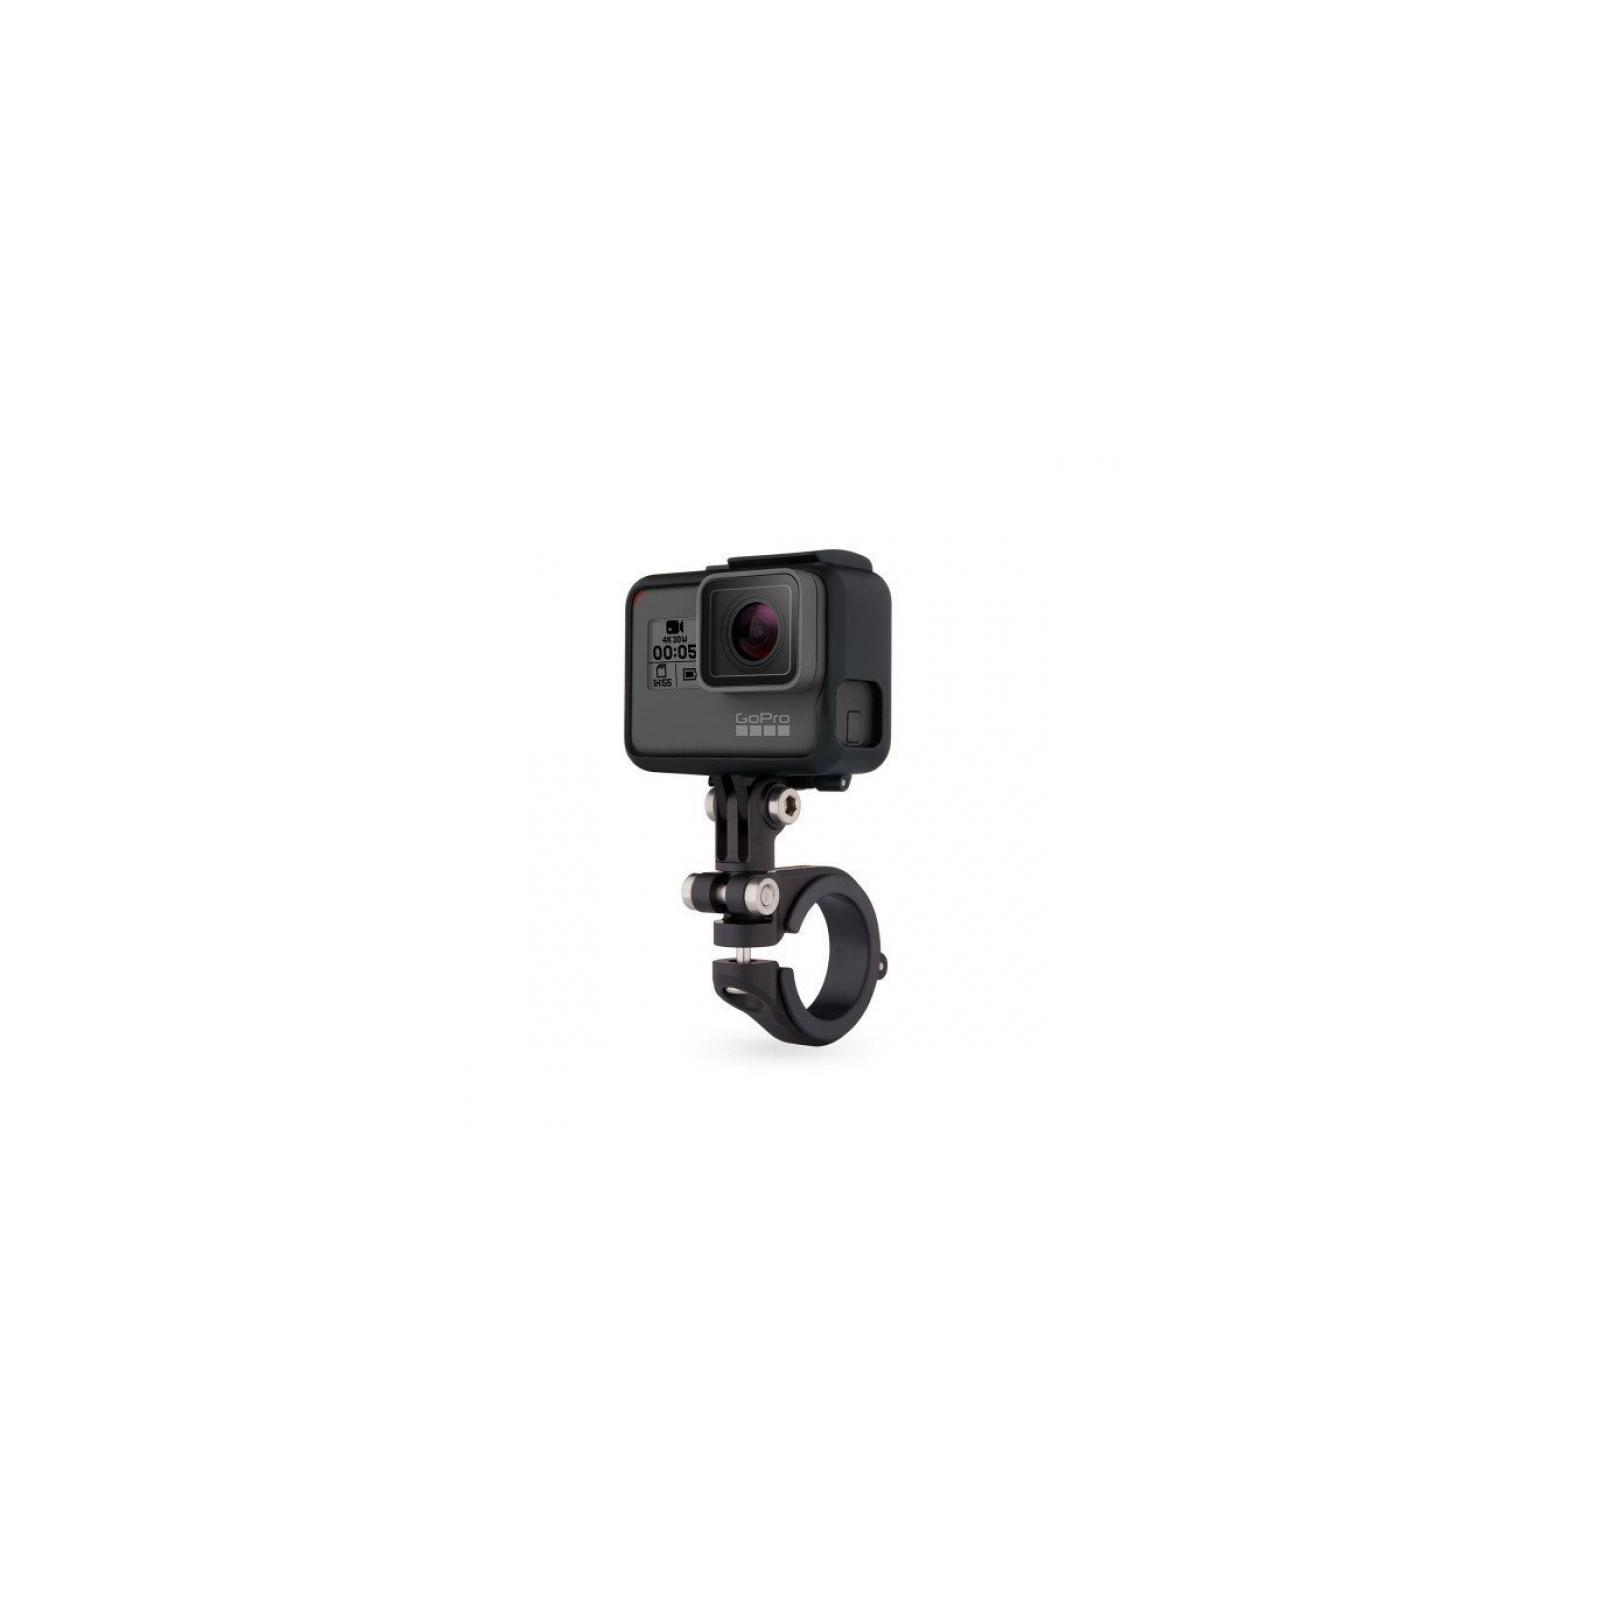 Аксессуар к экшн-камерам GoPro Handlebar Seatpost Pole Mo (AMHSM-001)